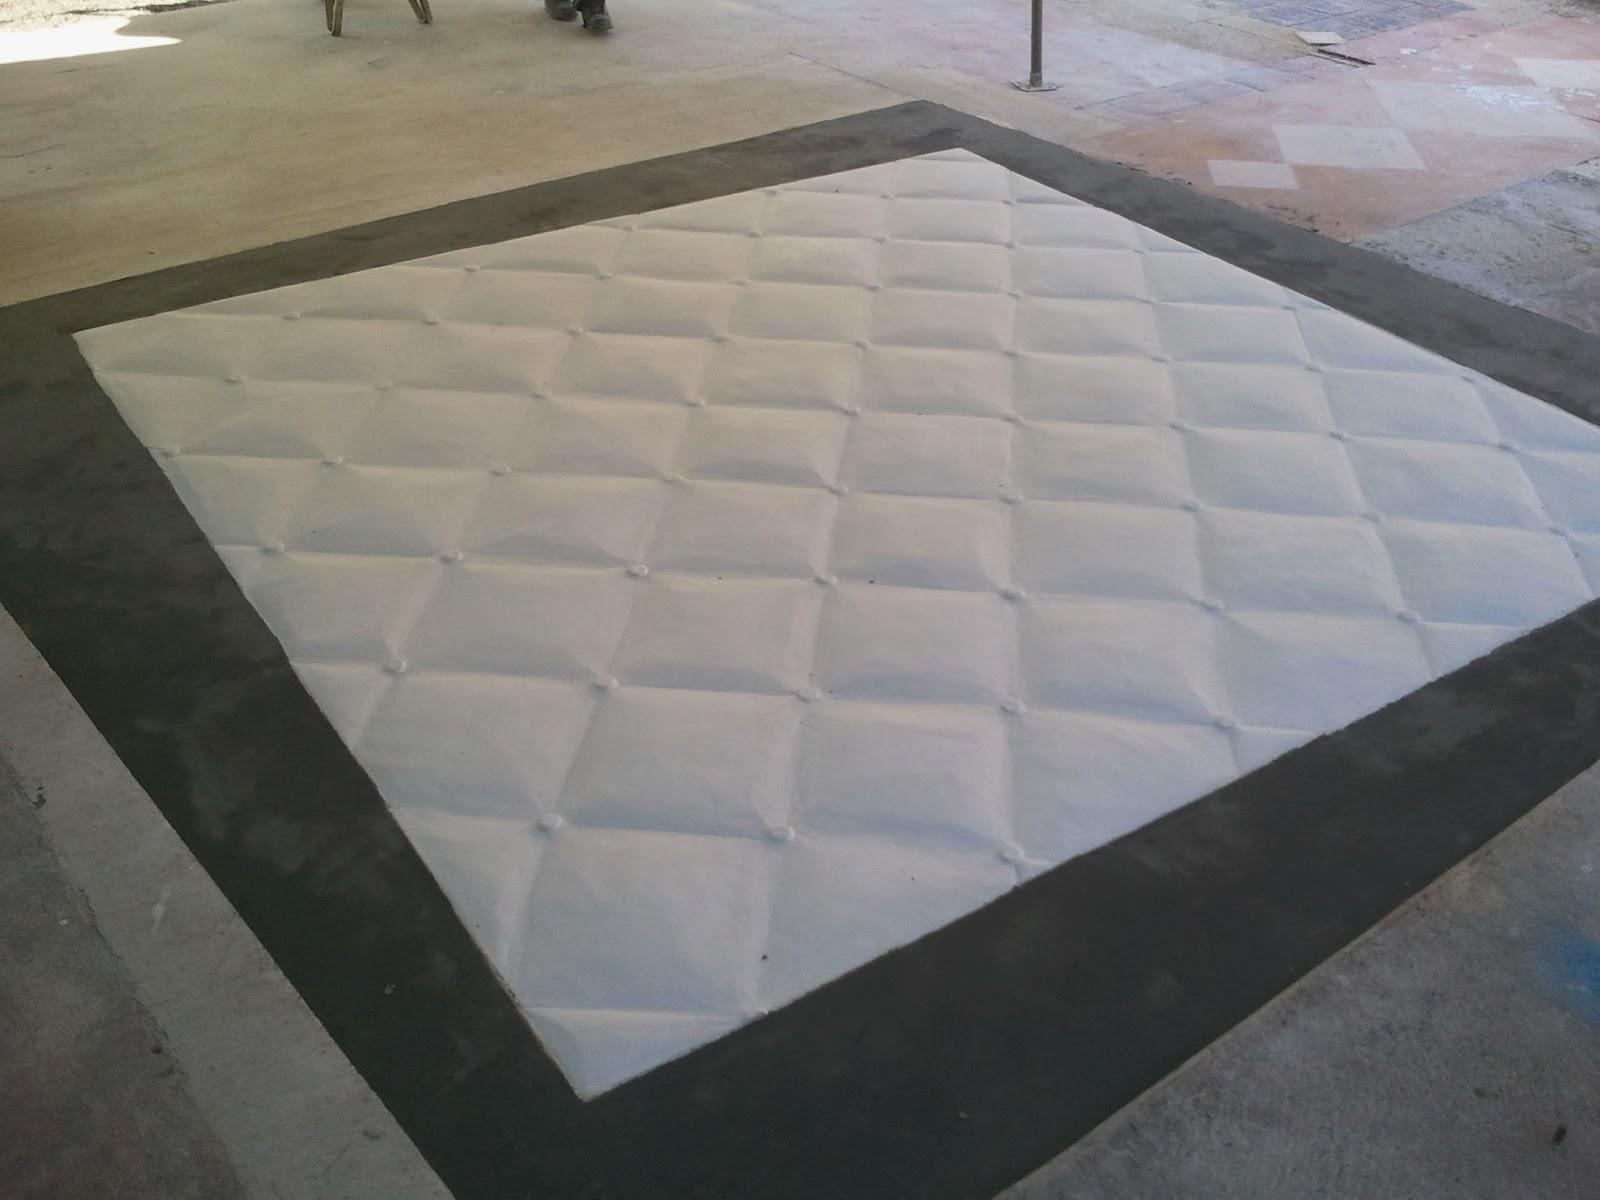 bton cir sur carrelage au sol bton cir sur carrelage au sol with bton cir sur carrelage au sol. Black Bedroom Furniture Sets. Home Design Ideas